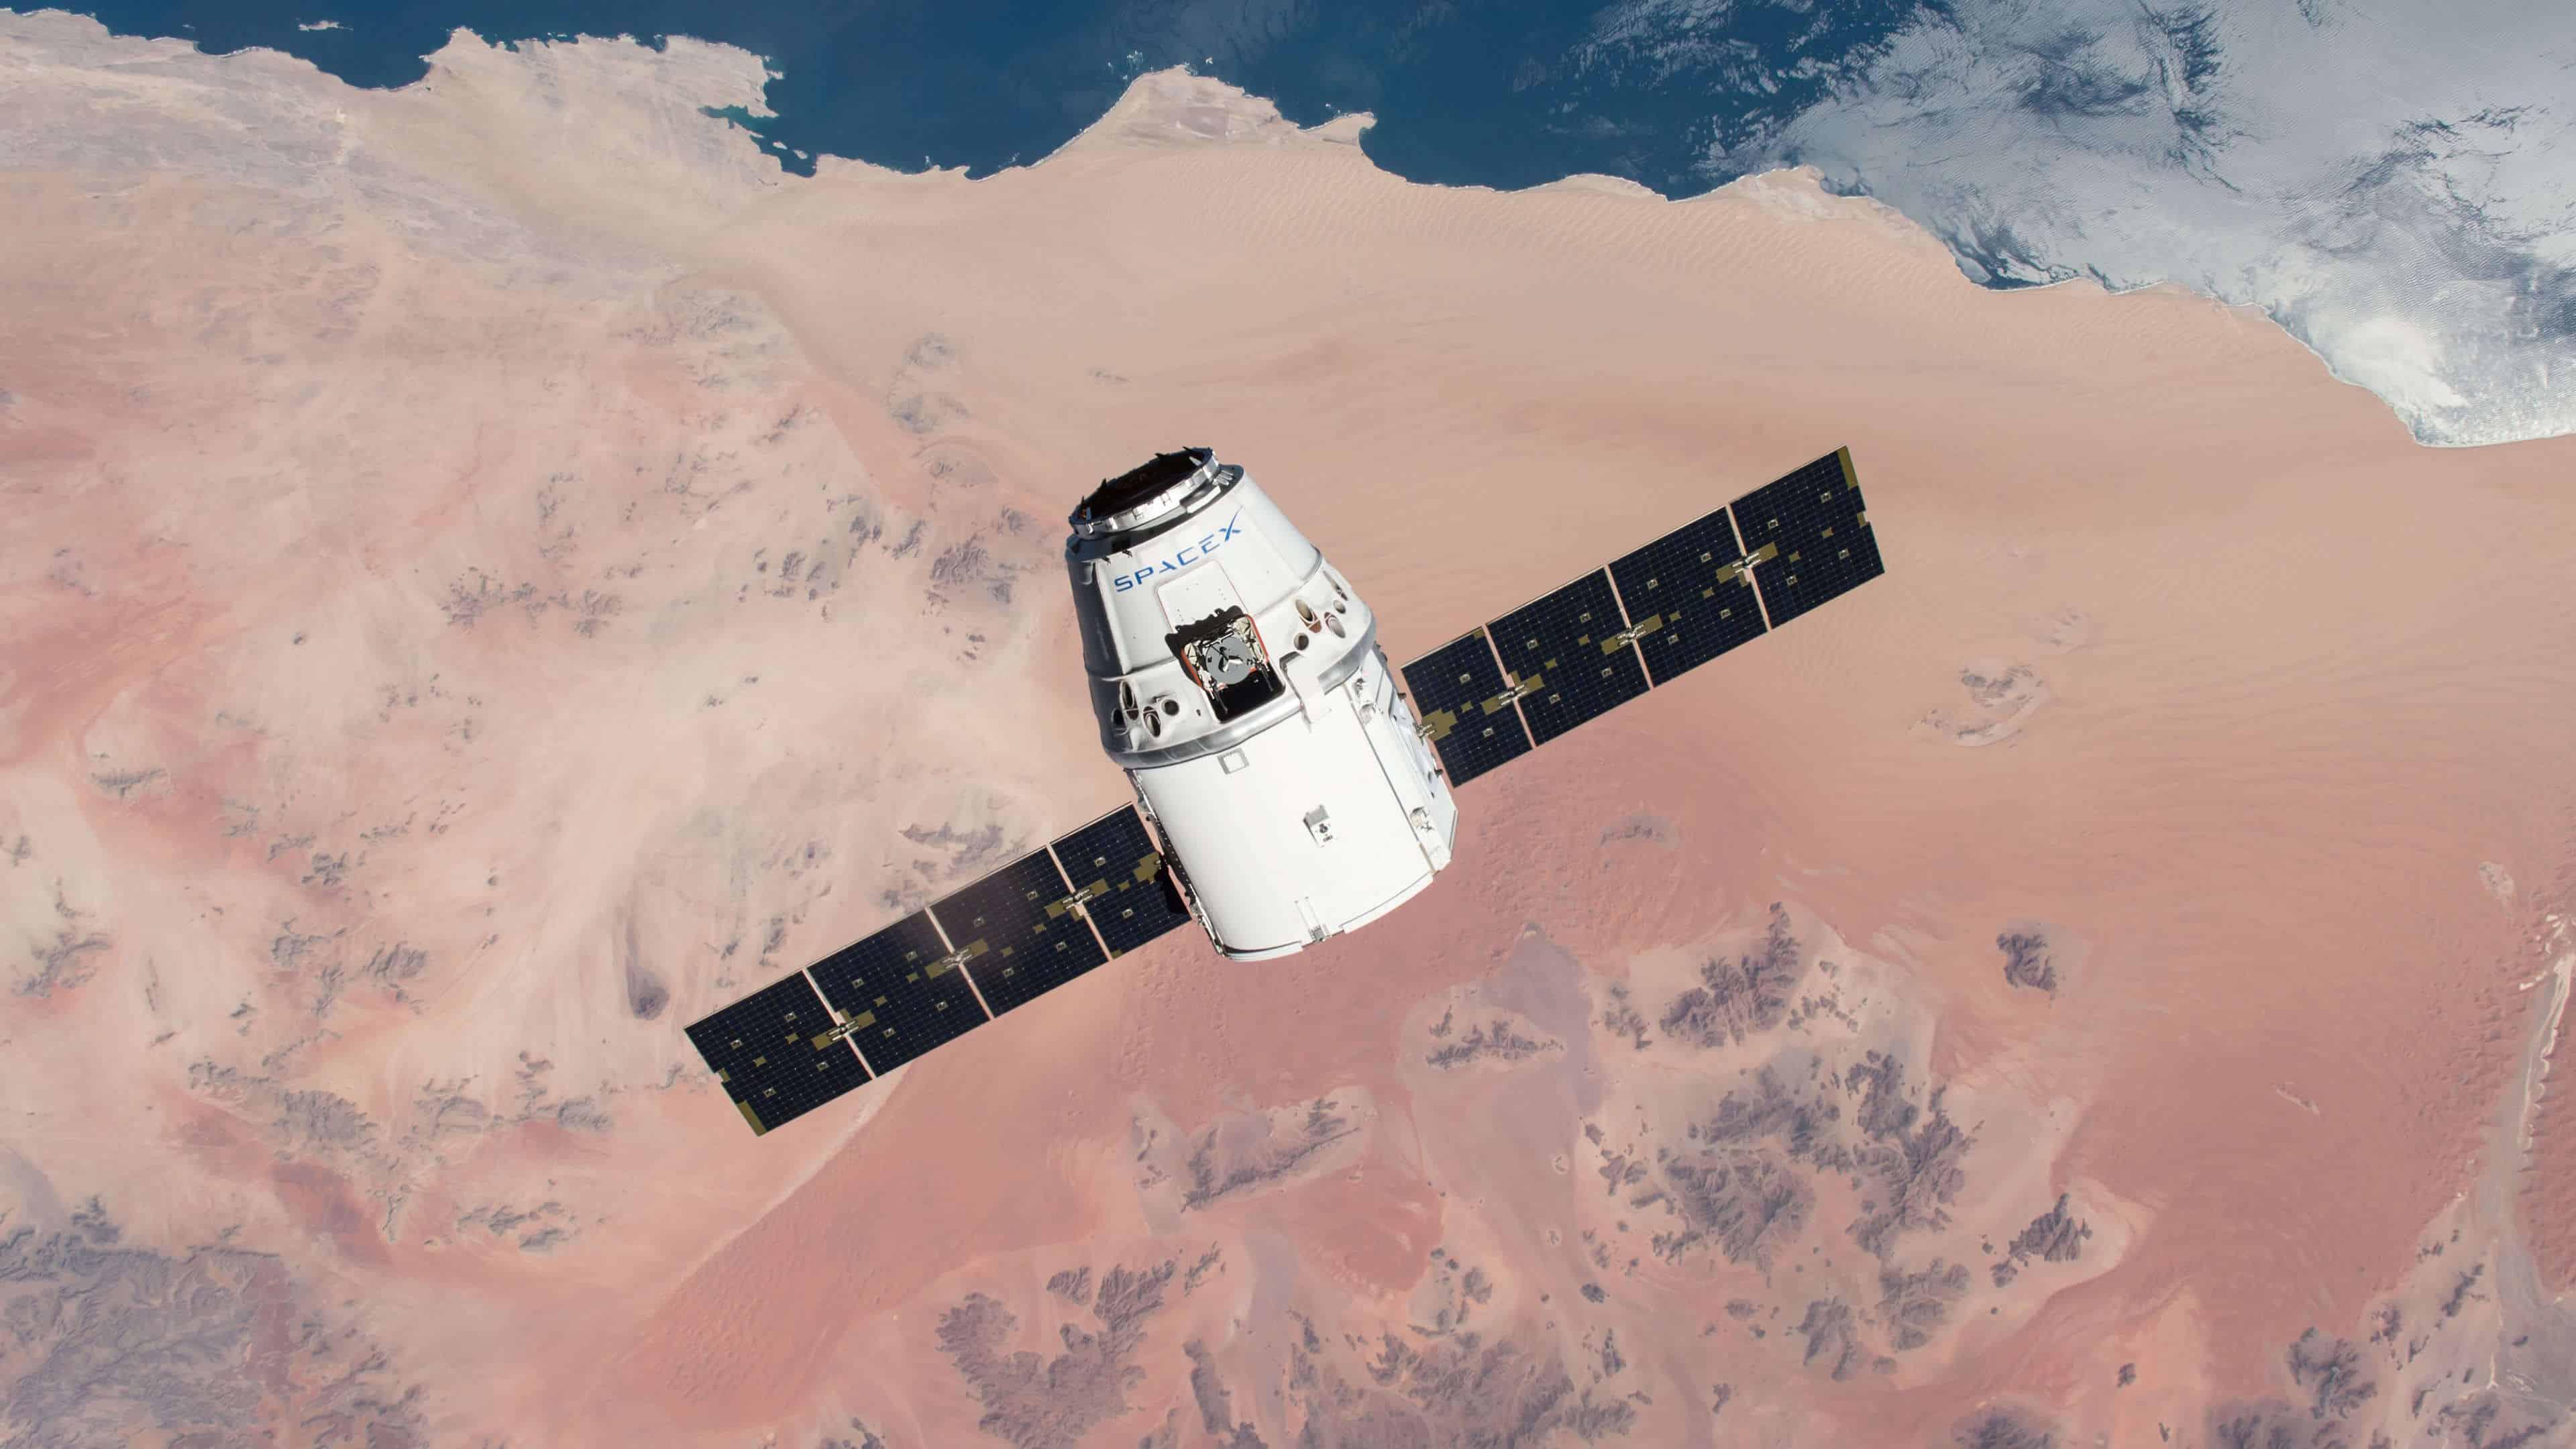 Spacex Dragon Capsule Uhd 4k Wallpaper Pixelz